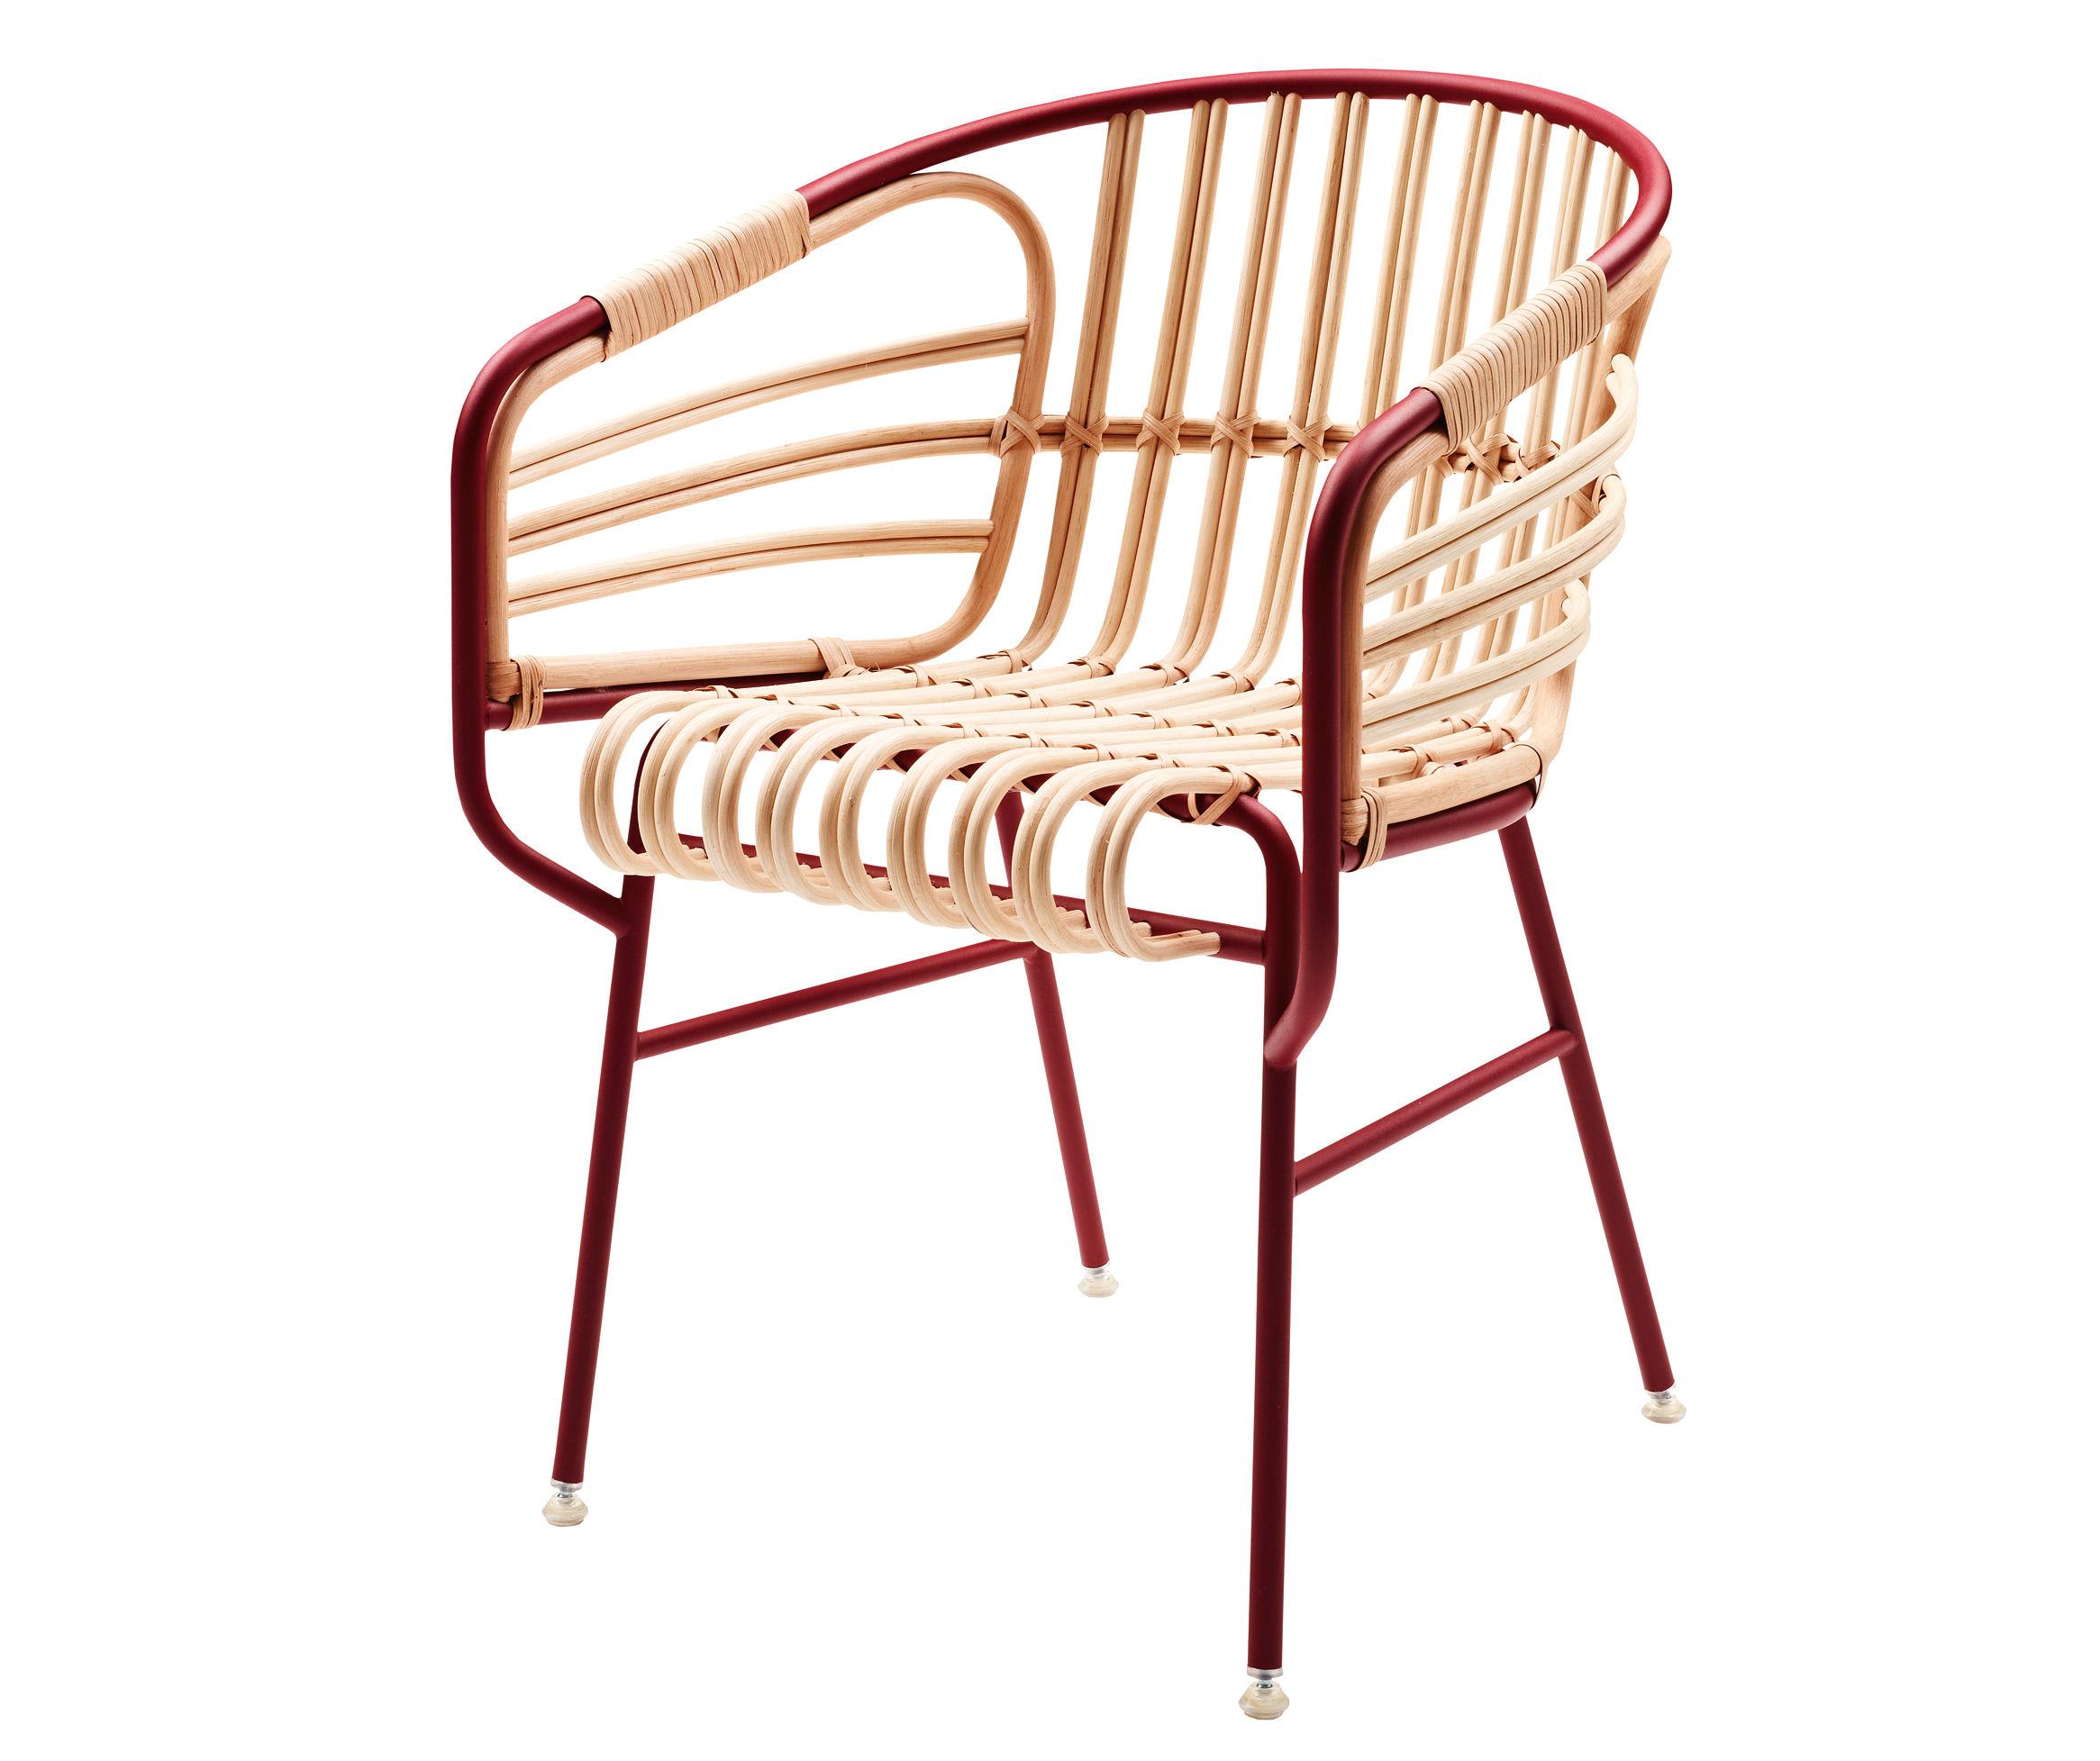 Möbel - Lounge Sessel - Raphia Sessel - Casamania - Bordeaux-rot - Jonc, lackiertes Metall